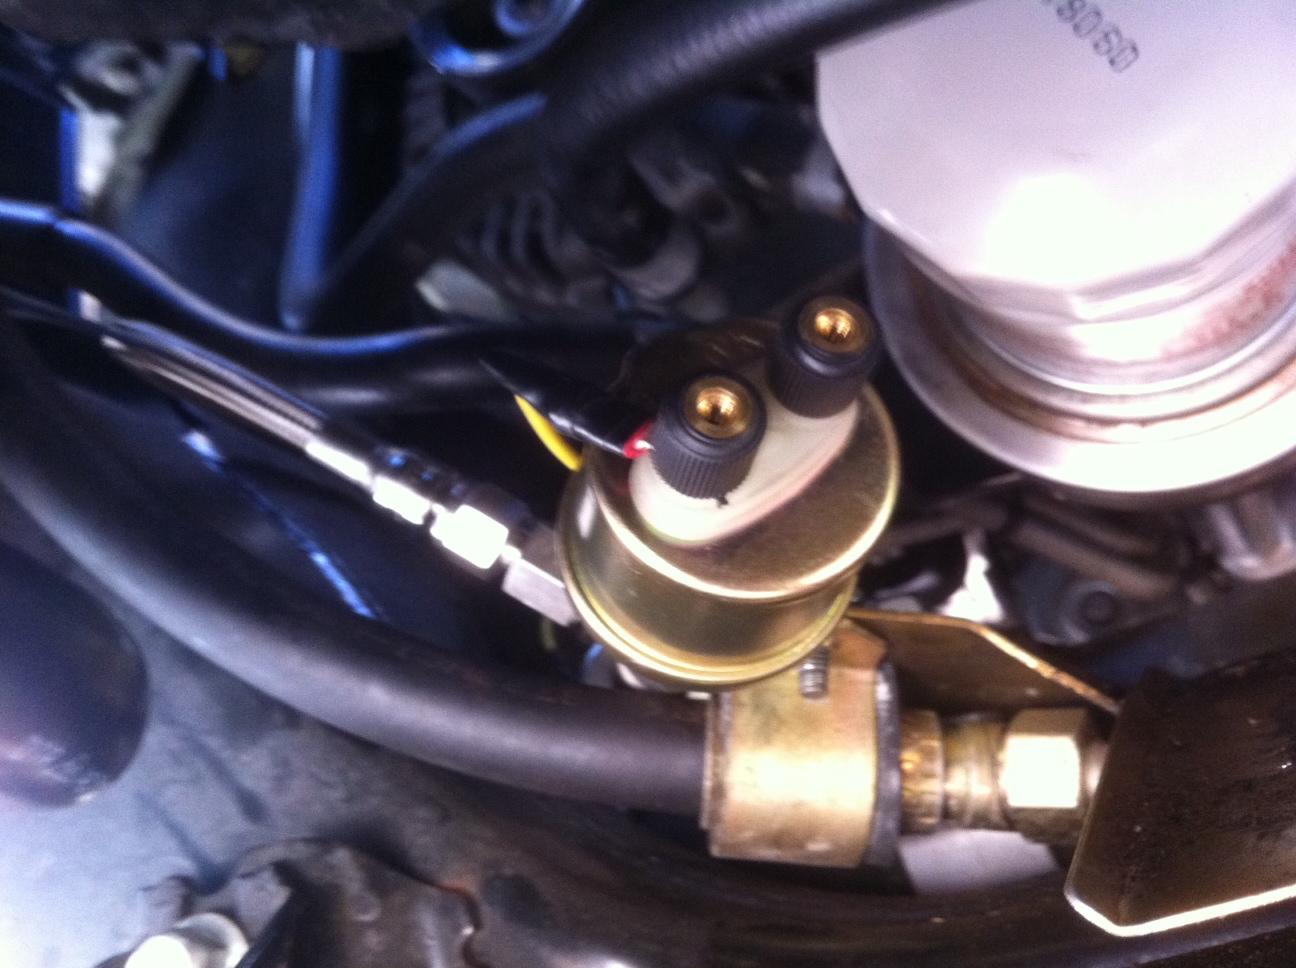 How To (Sort of): Install Aftermarket Oil Pressure Gauge